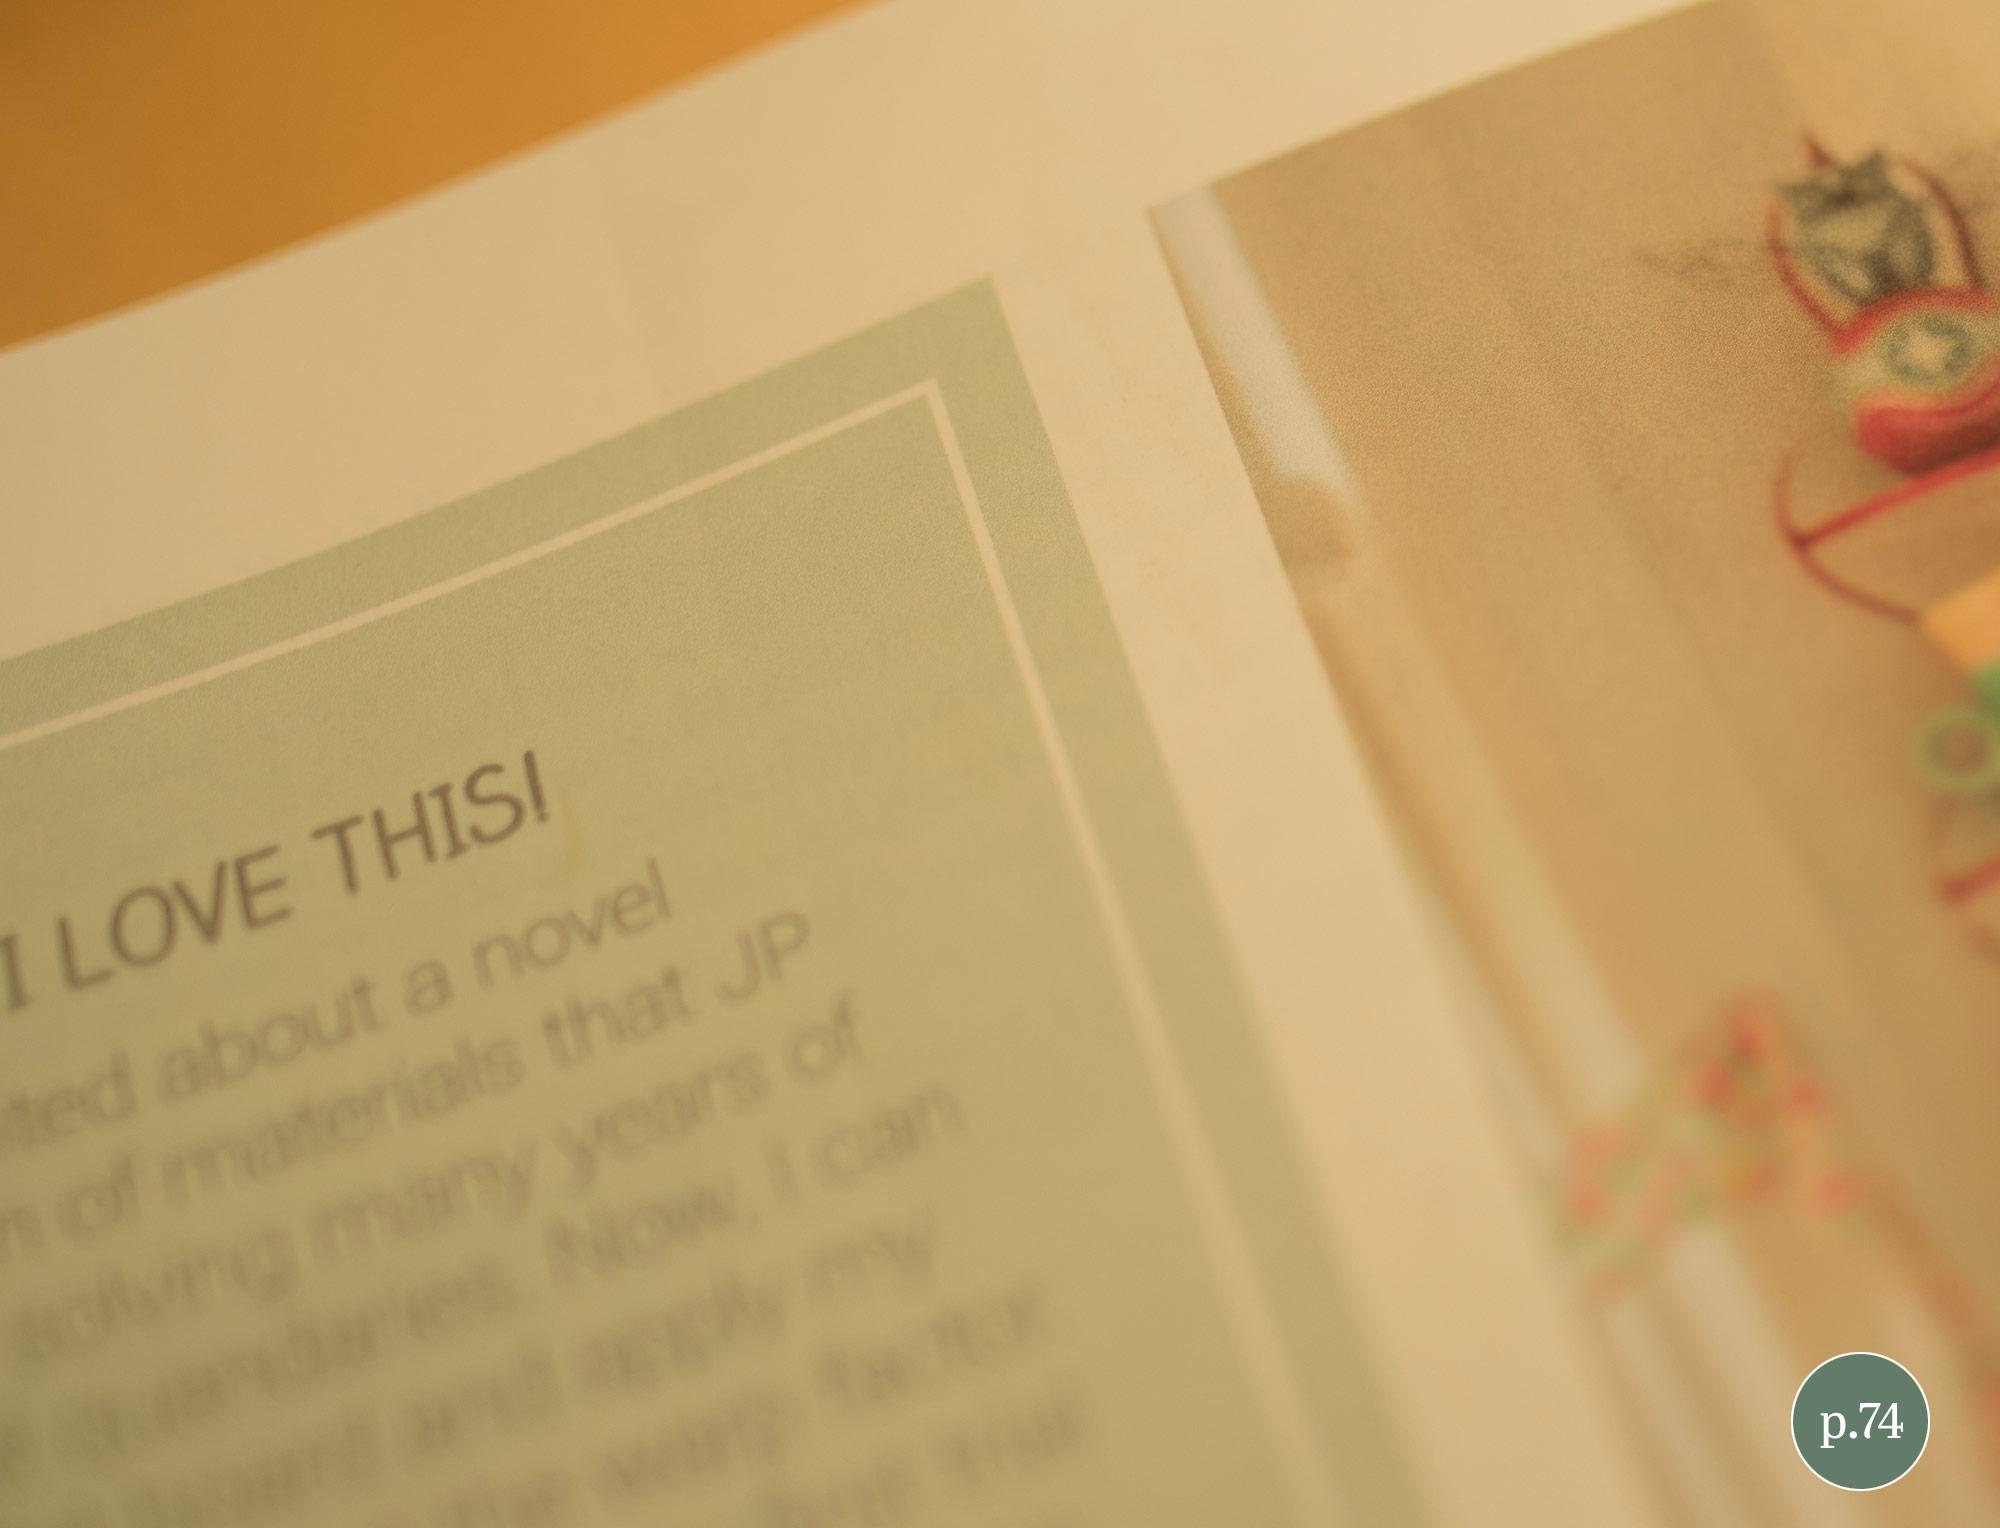 Johanna-Parker-Evergreen-Owliver-pg-74.jpg